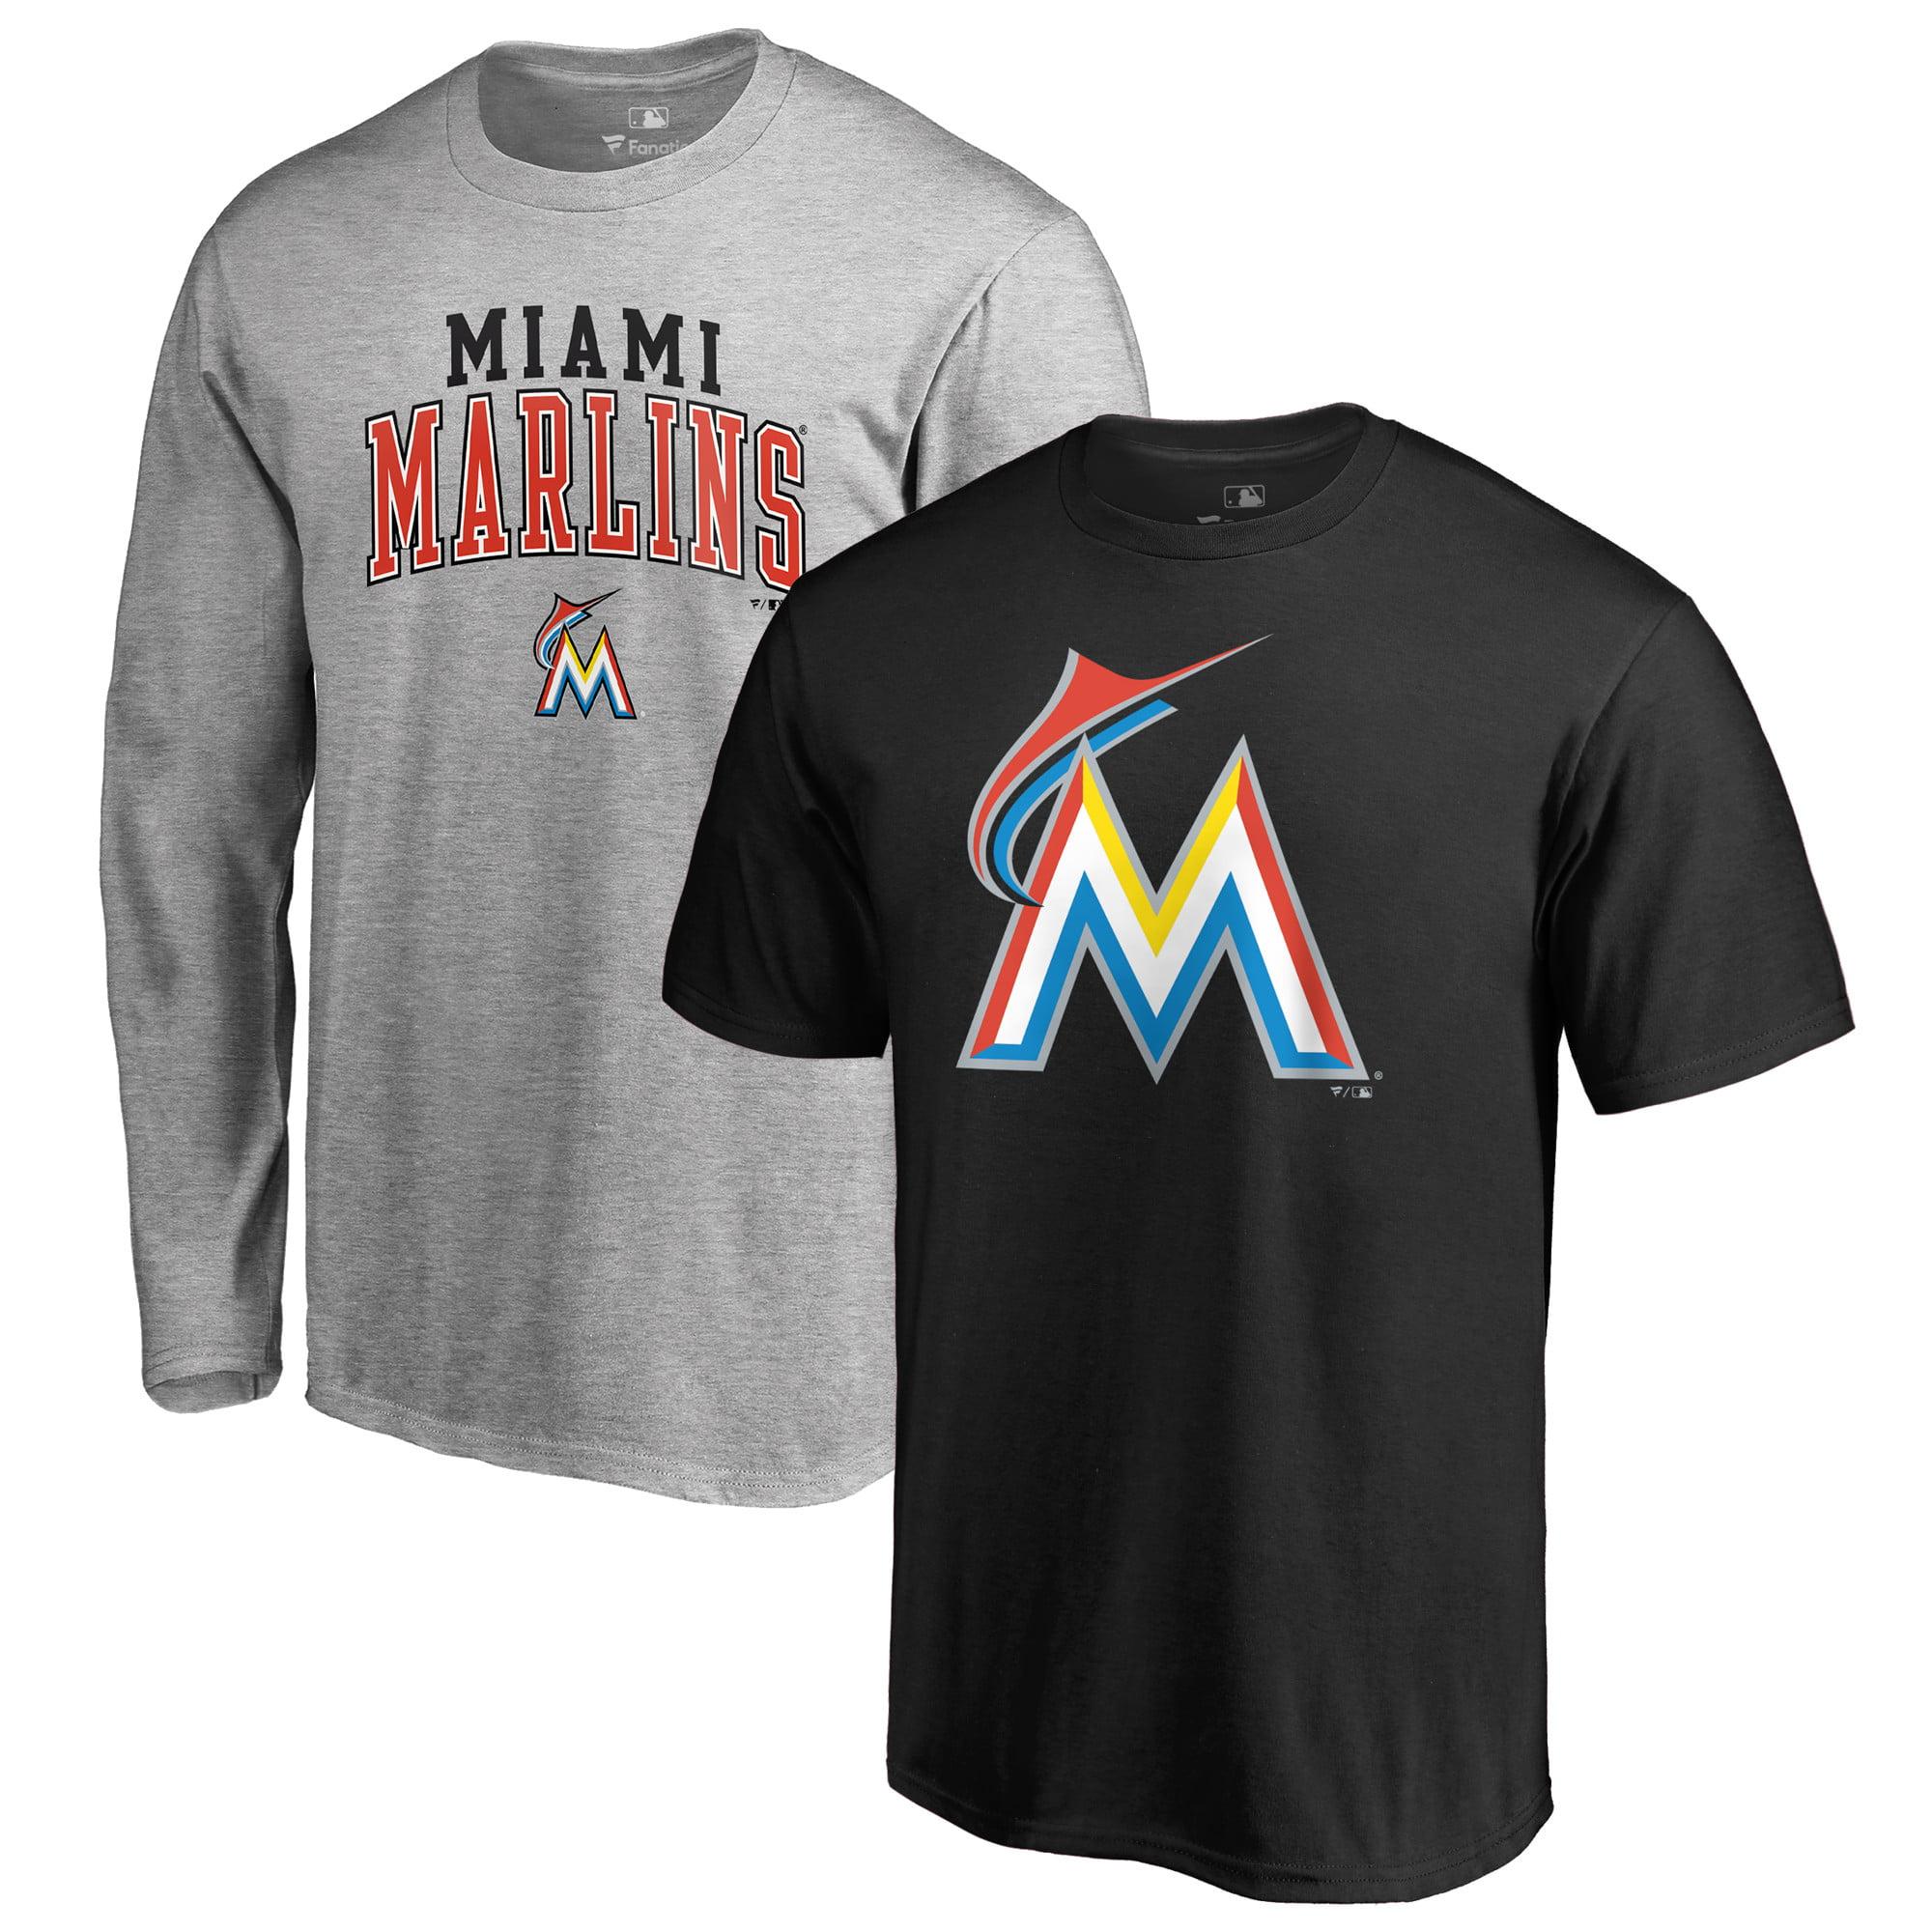 Miami Marlins Fanatics Branded T-Shirt Combo Set - Black/Gray